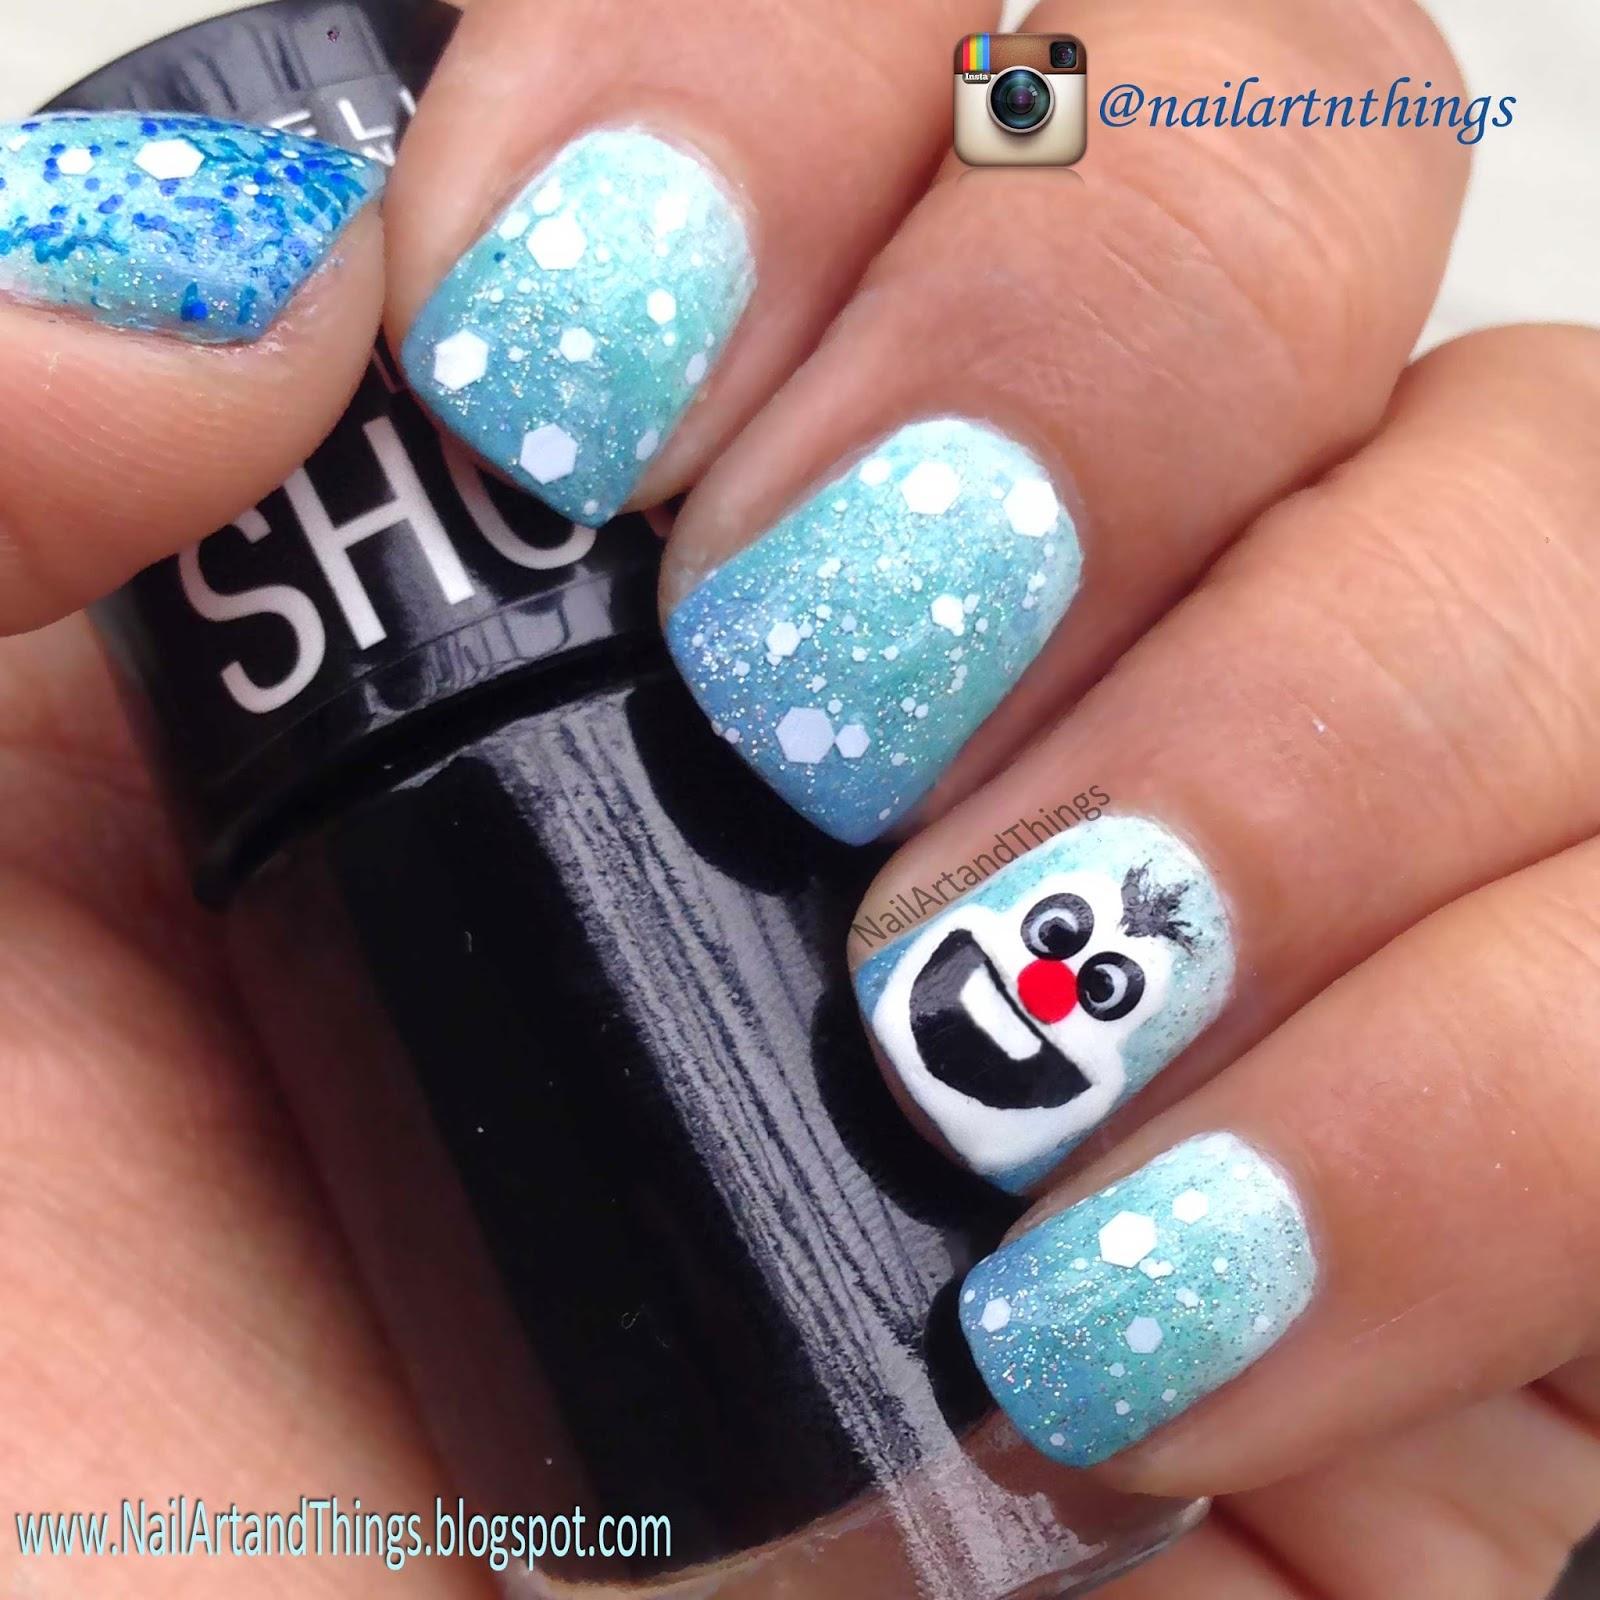 NailArt and Things: Frozen Movie Nail Art ft. Olaf